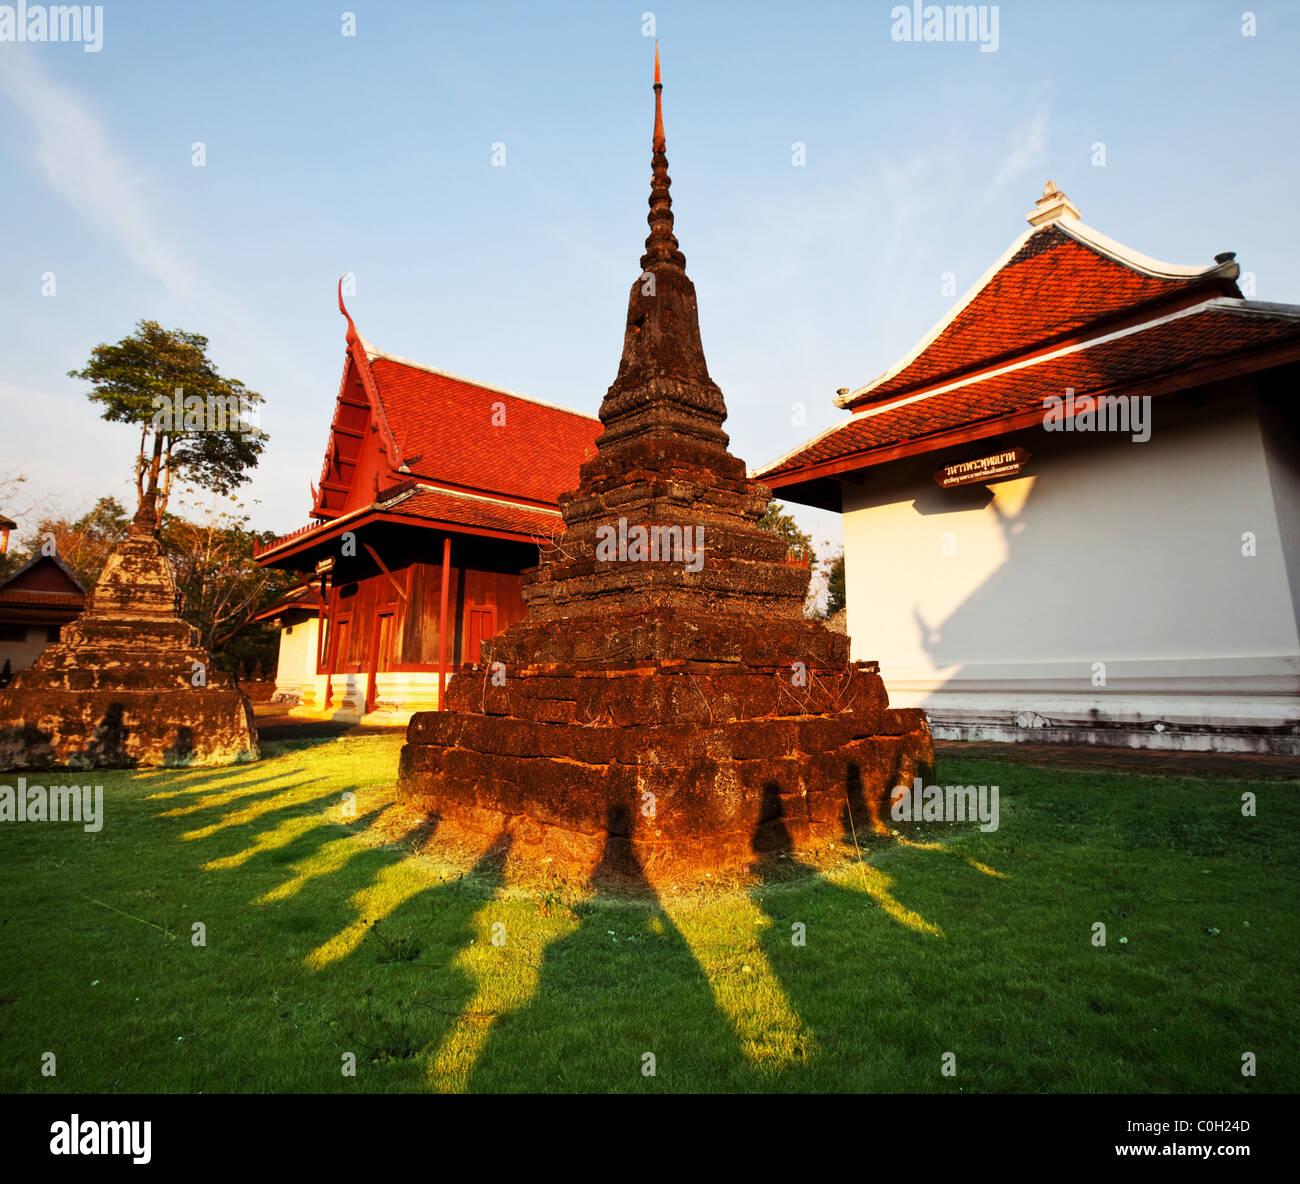 Templo a Trat, Tailandia Imagen De Stock